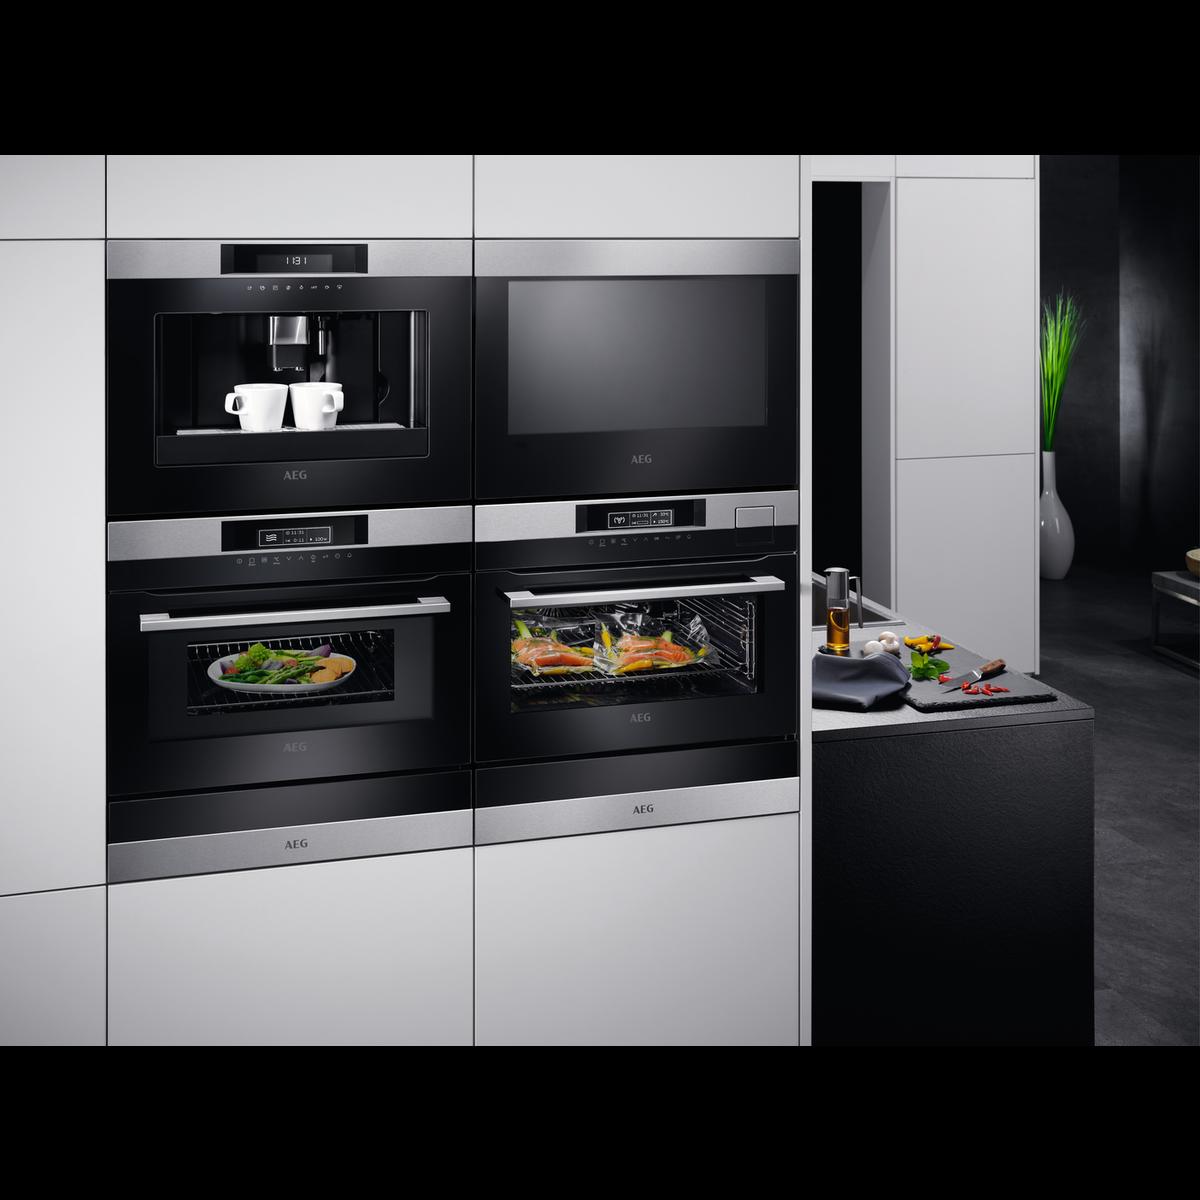 aeg kmk761000m einbauherd backofen edelstahl mit. Black Bedroom Furniture Sets. Home Design Ideas